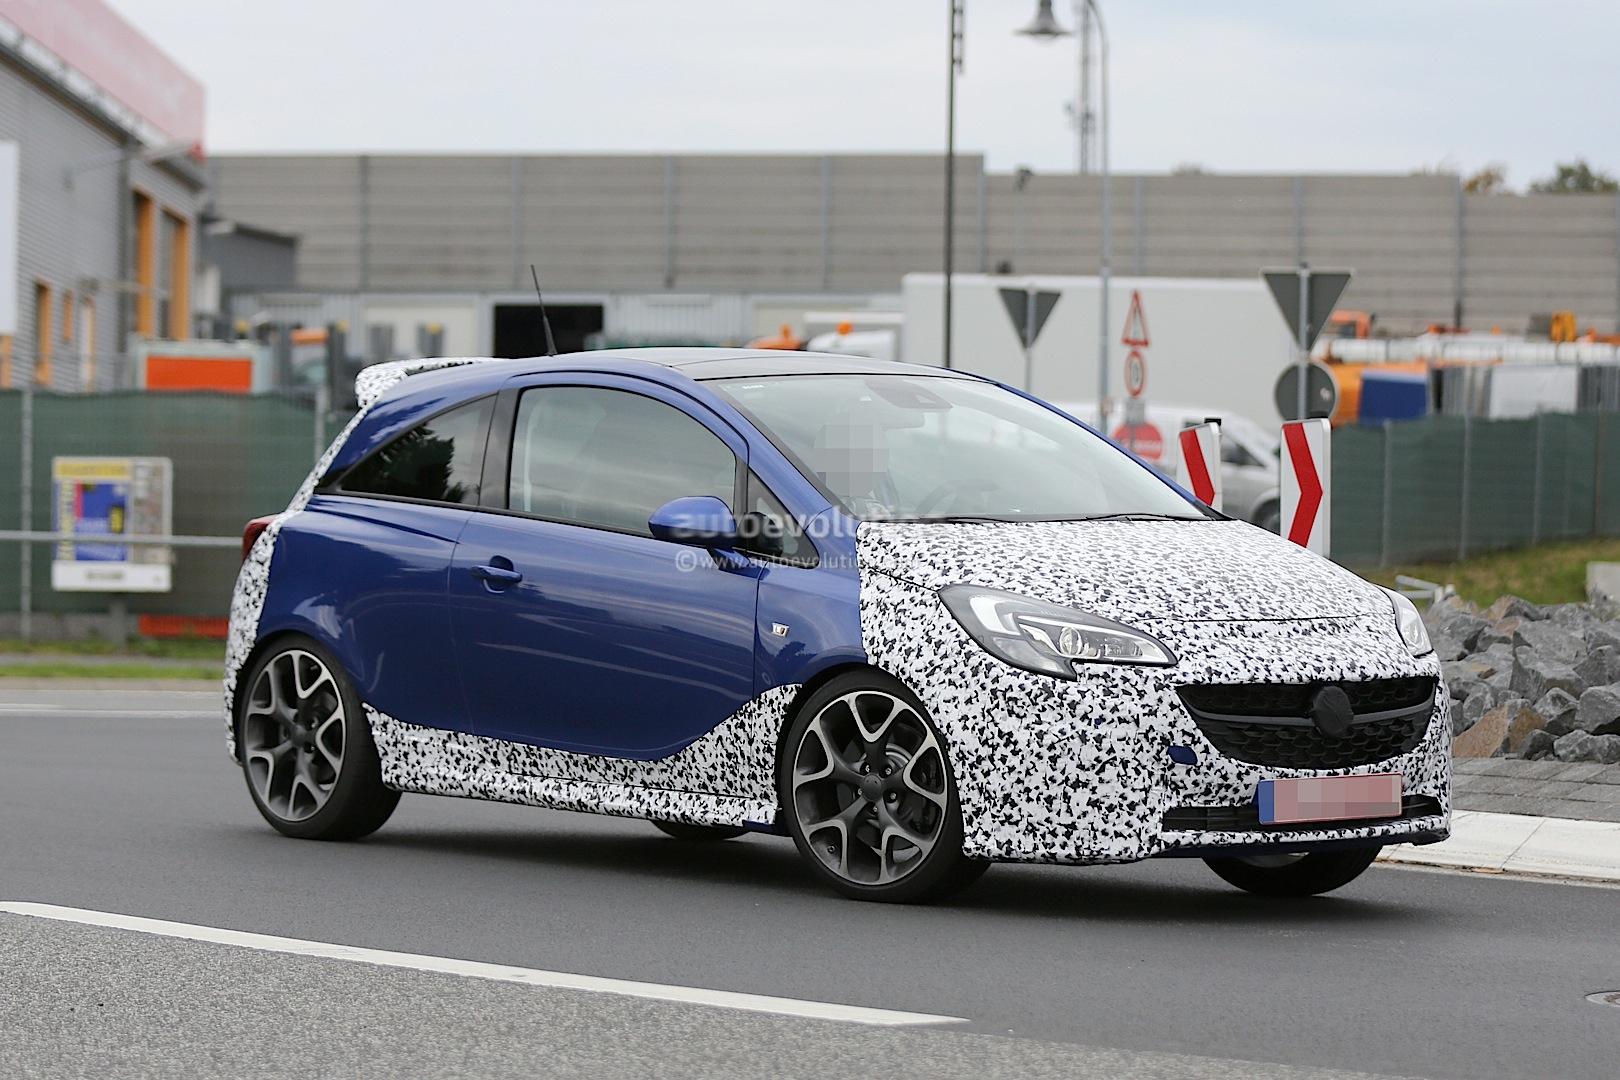 2014 - [Opel] Corsa IV [E] - Page 3 2015-opel-corsa-opc-spied-testing-photo-gallery_4